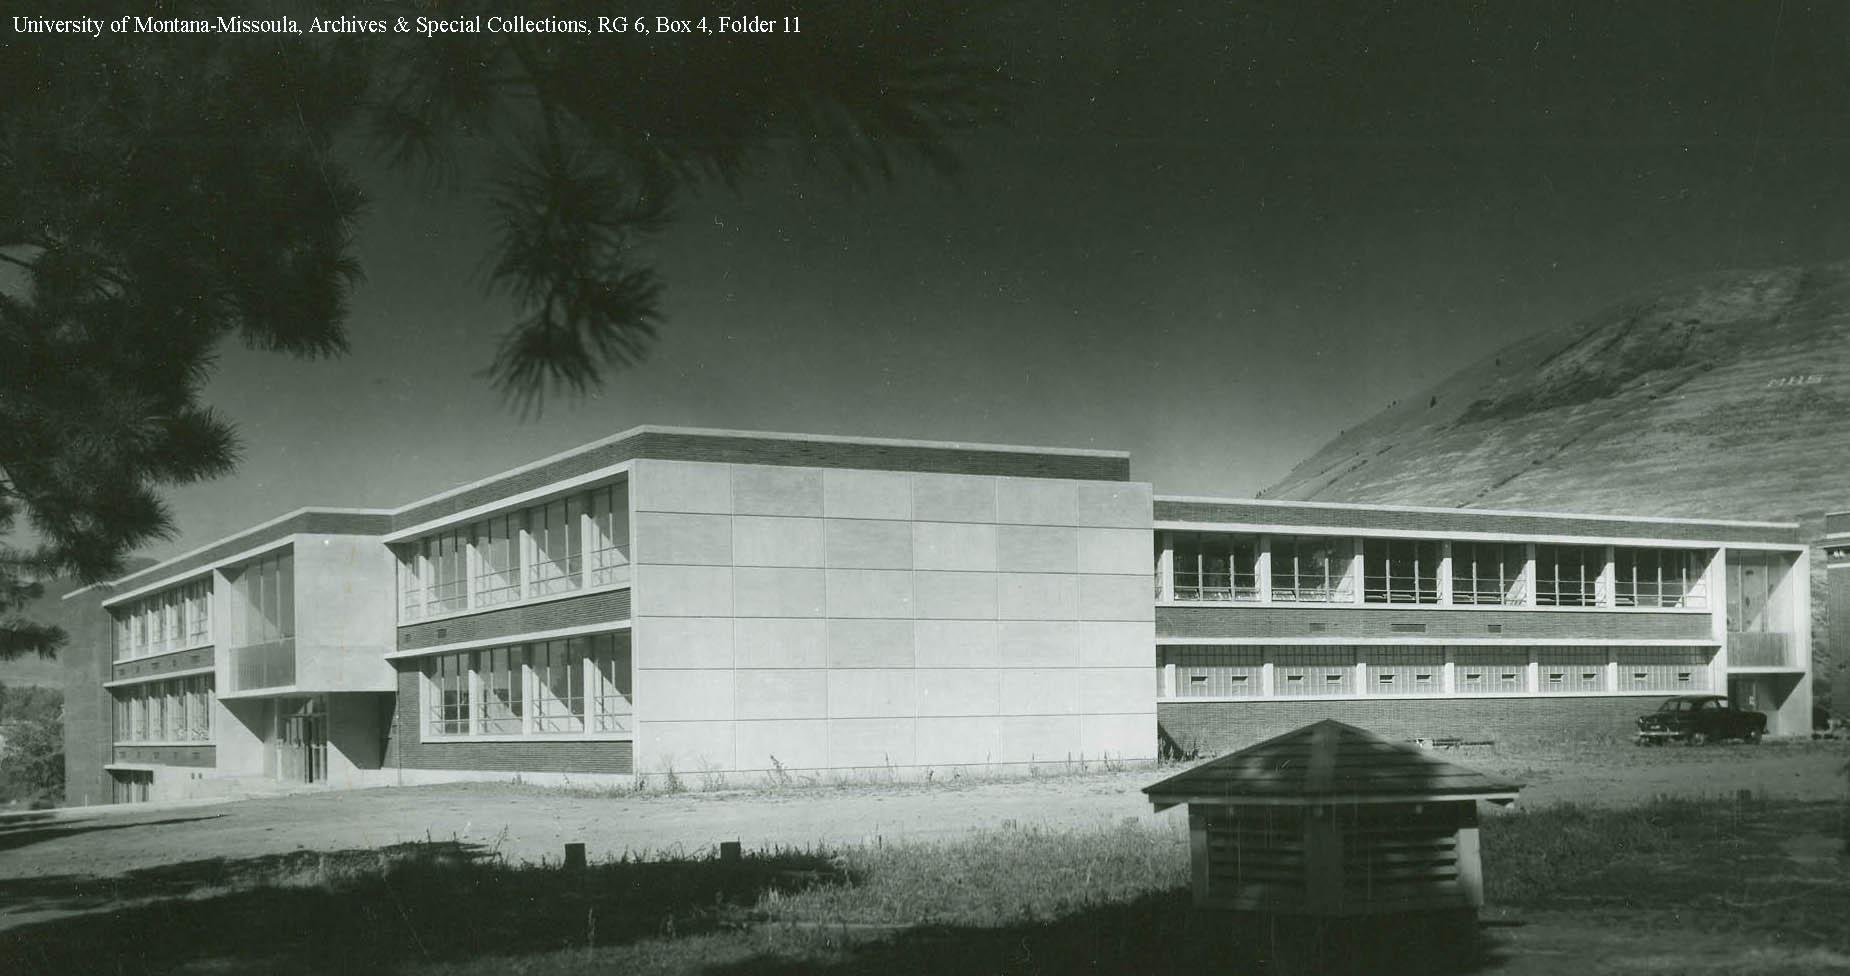 Picture of the building's original exterior. (Photo Undated)